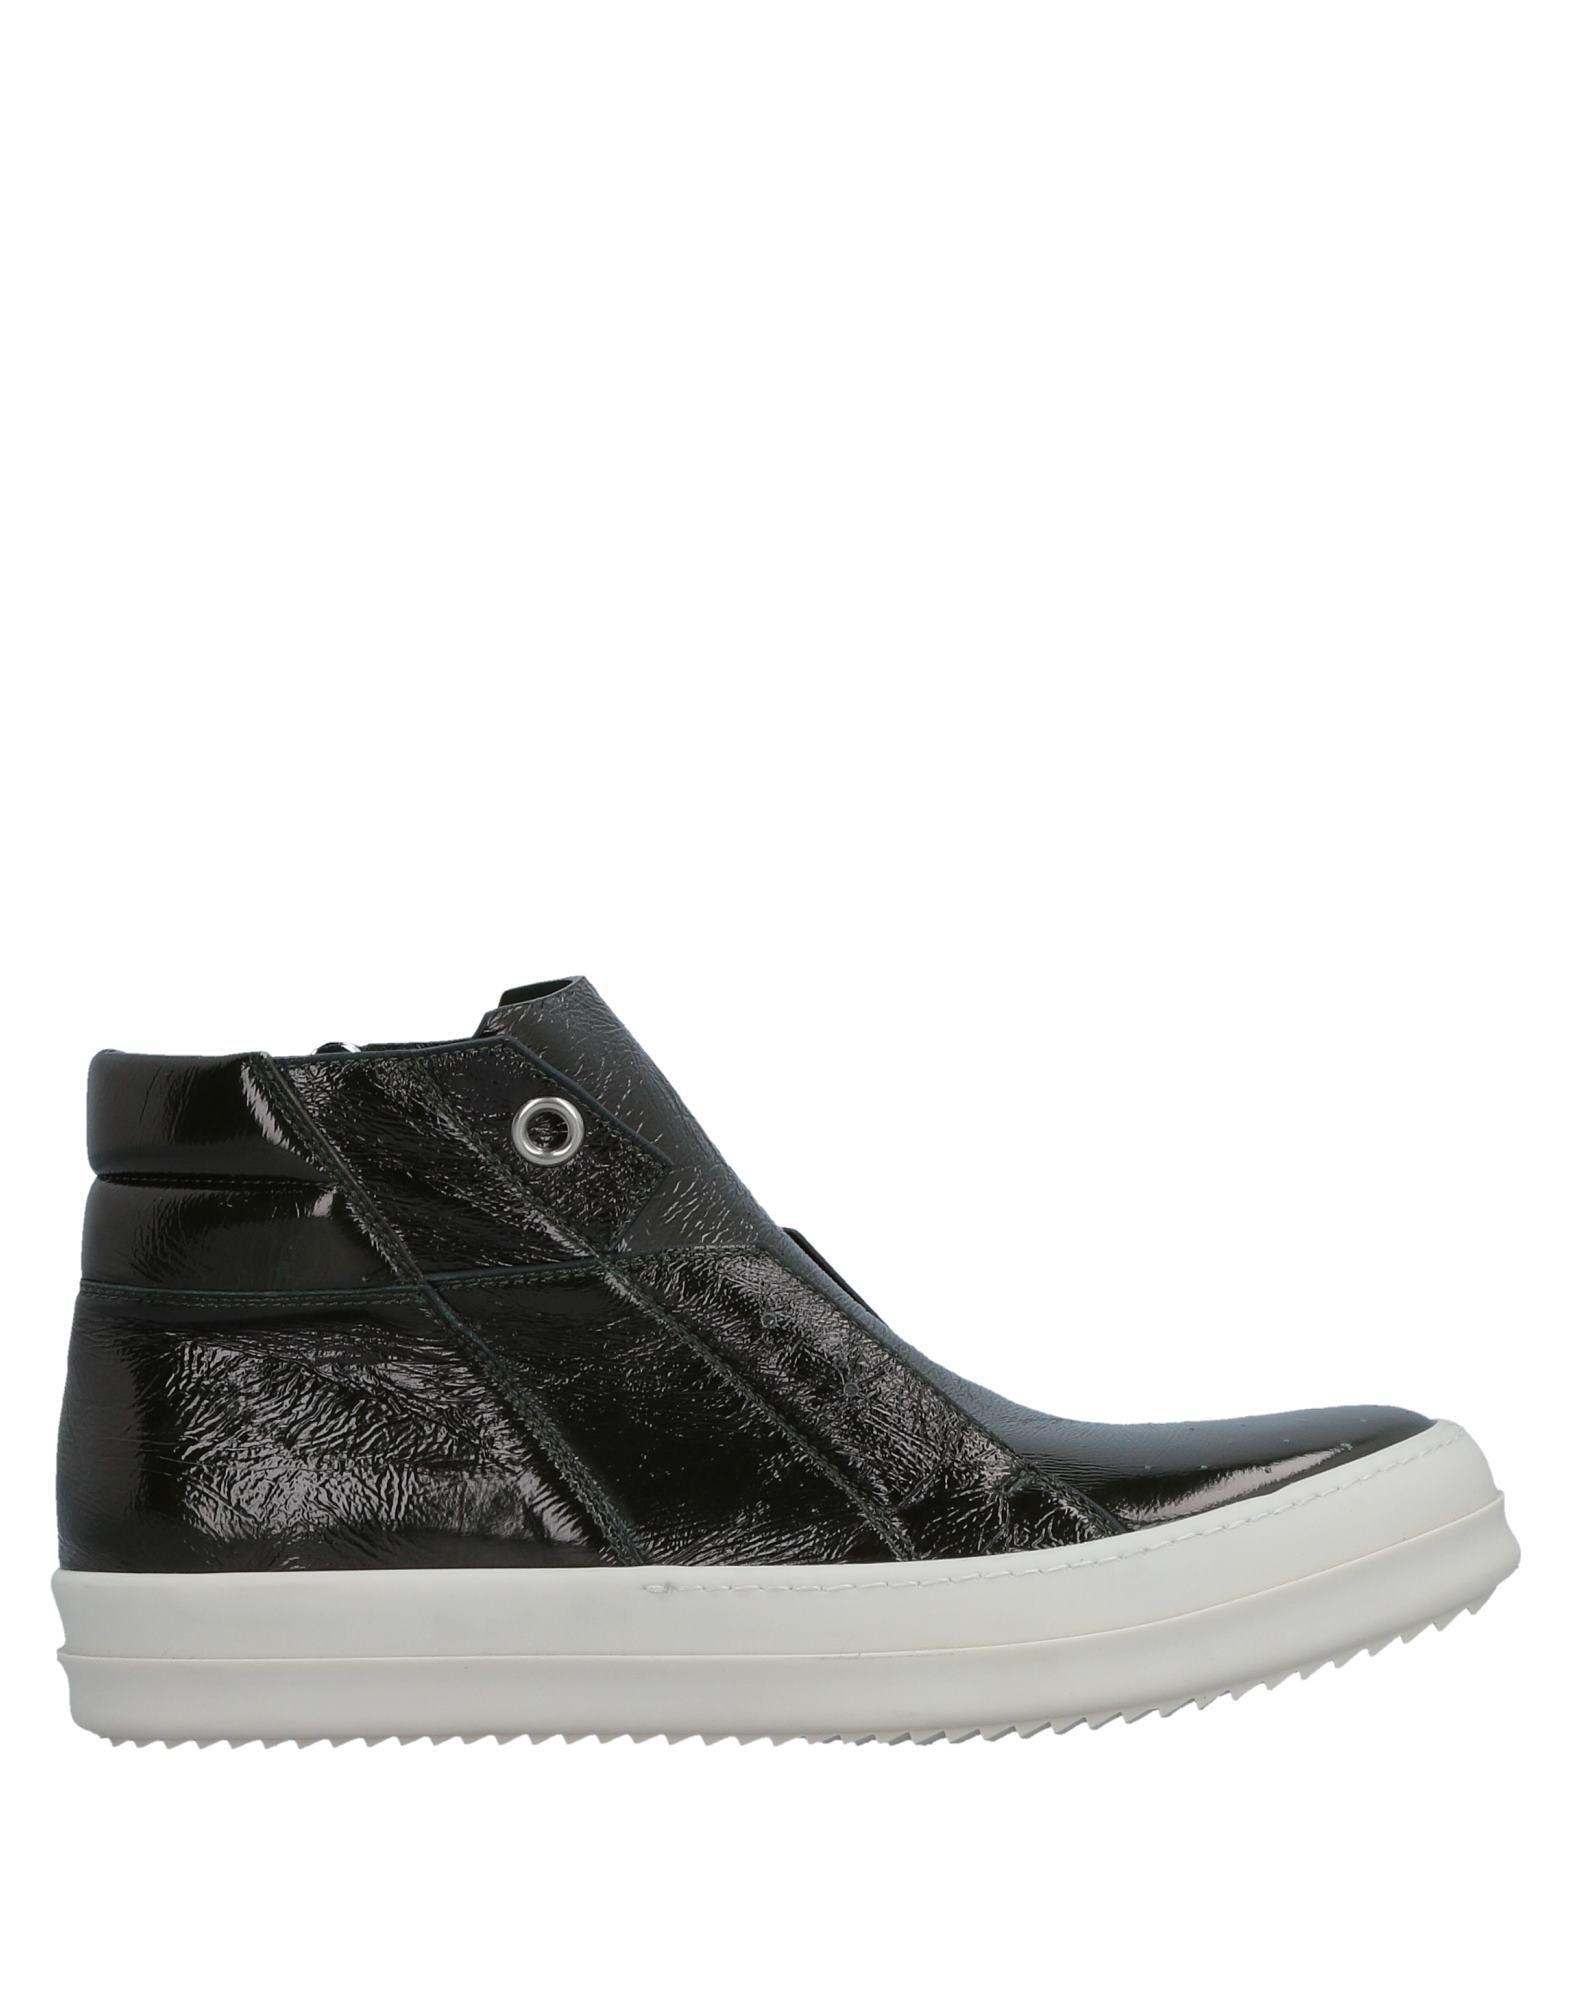 Rick Owens Sneakers - Men Rick Owens Sneakers online 11519989GL on  Canada - 11519989GL online 006916